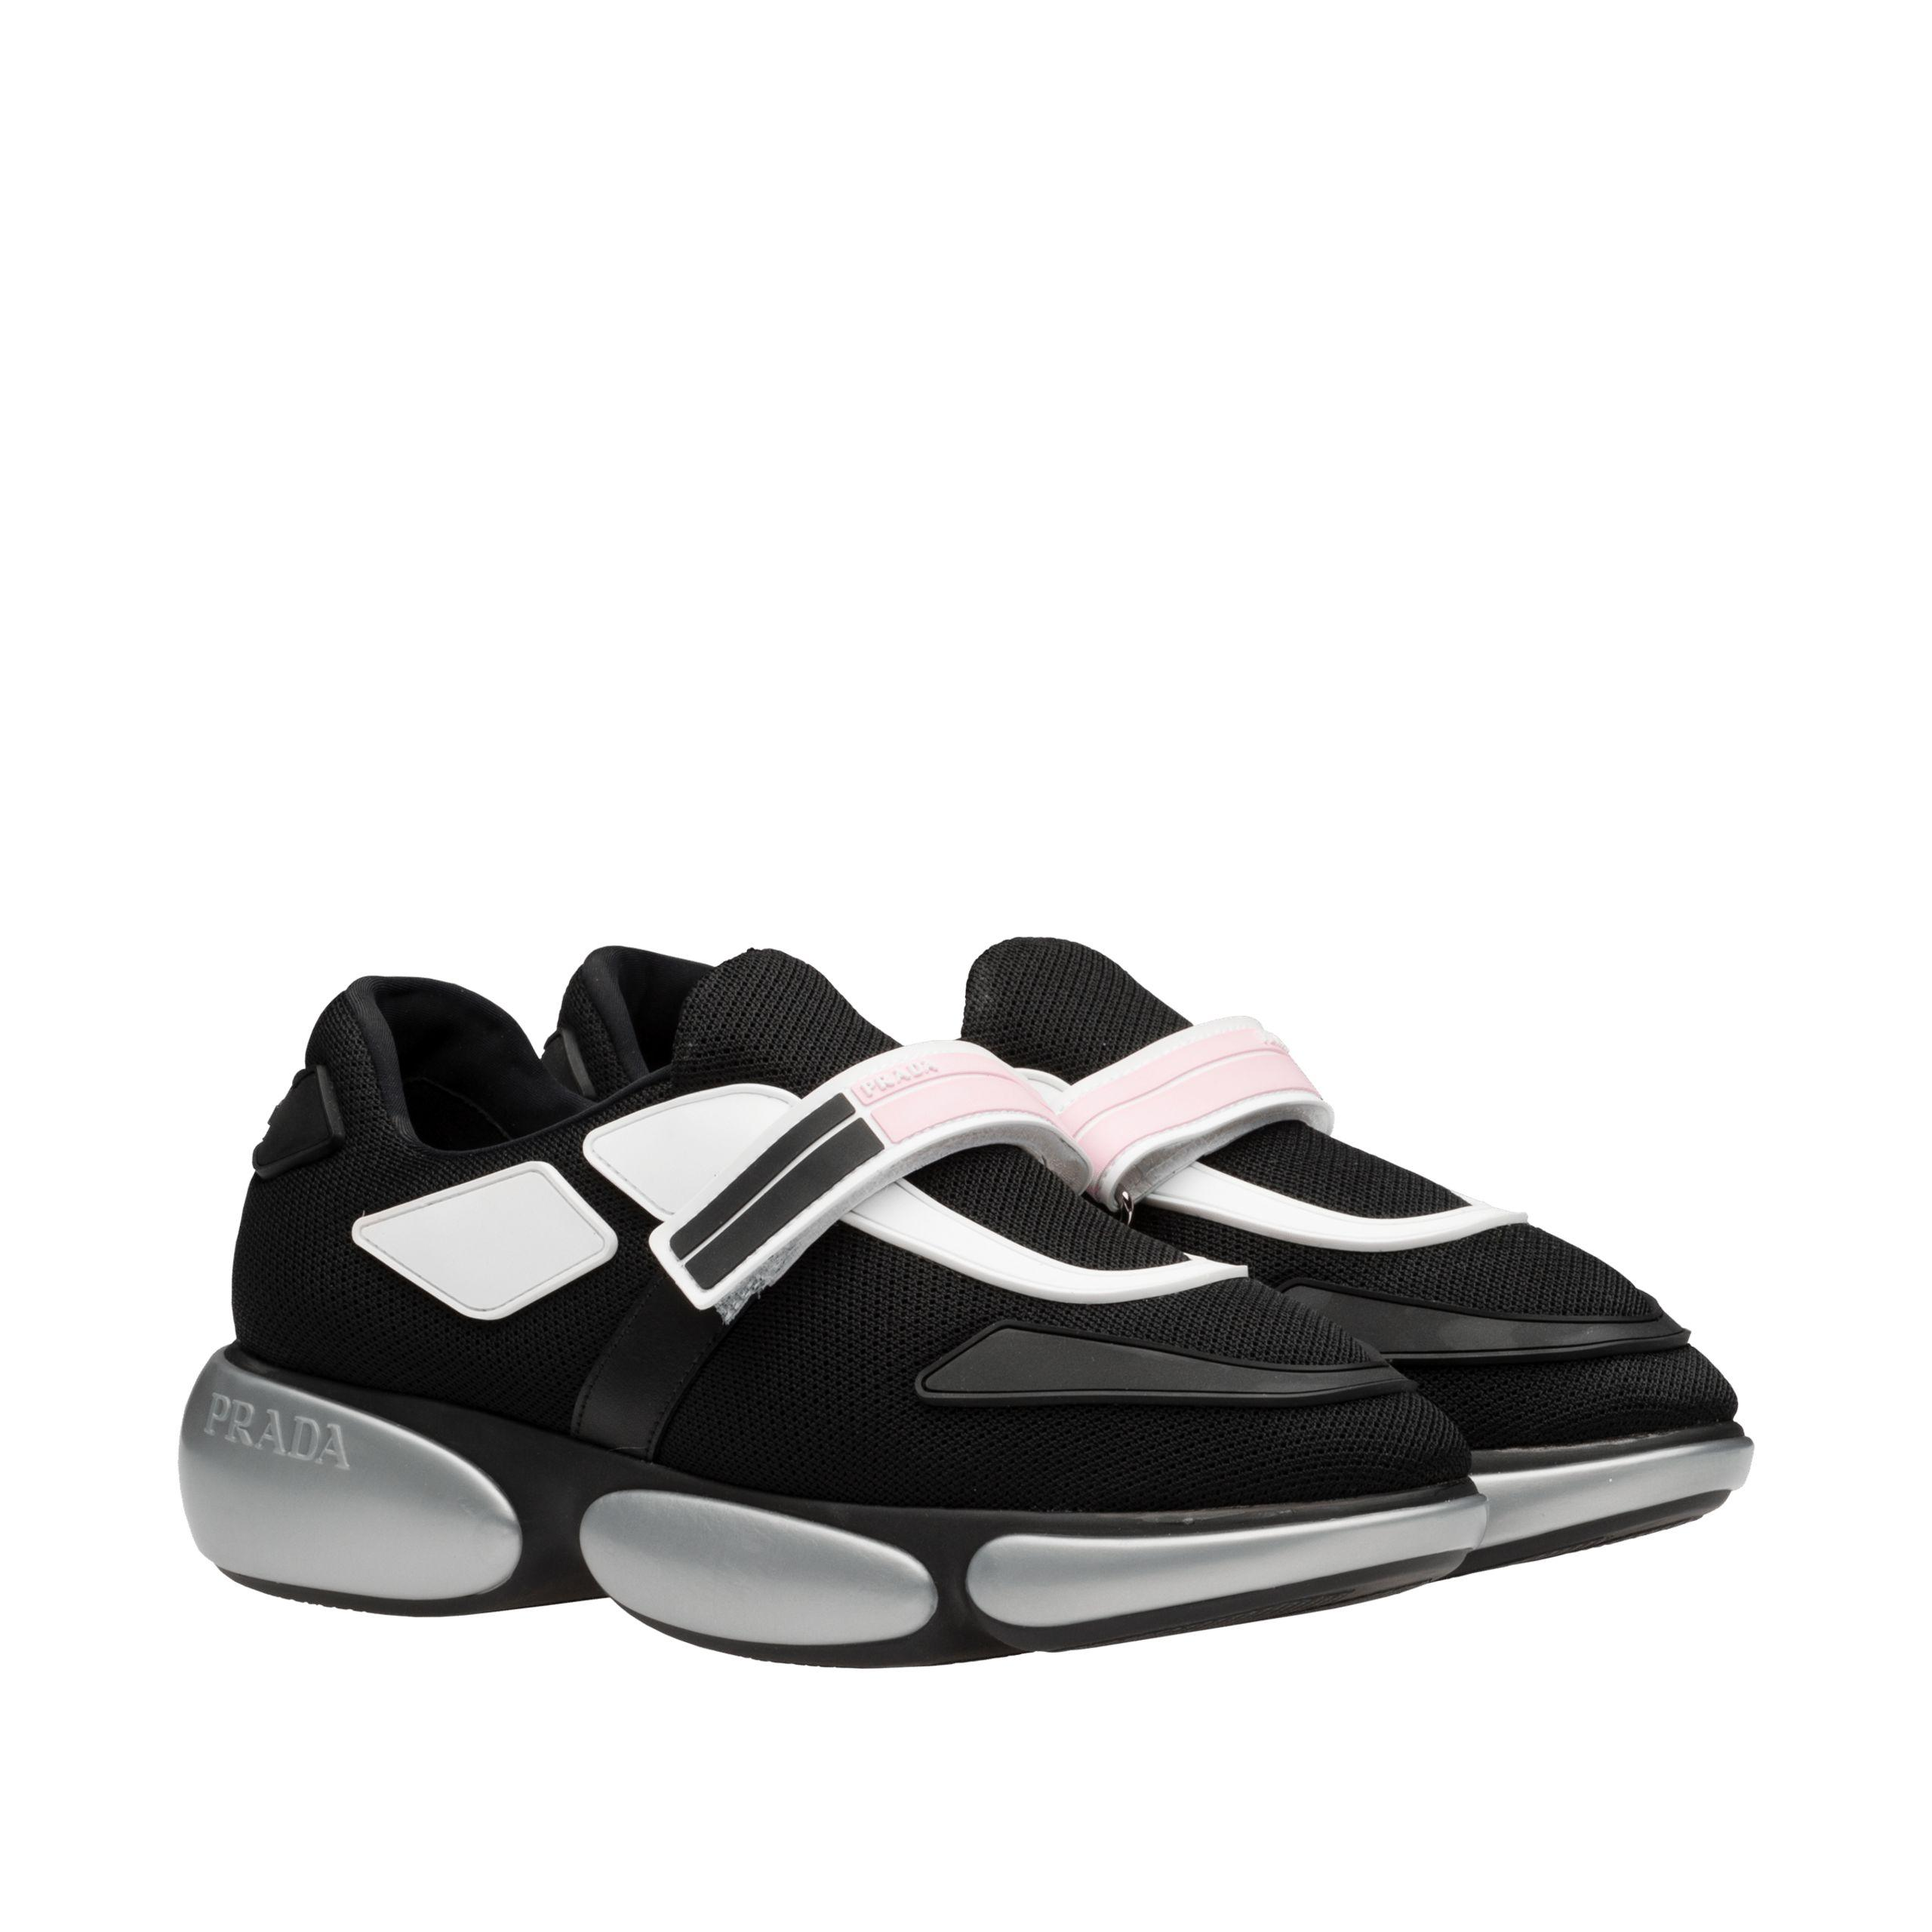 promo code 5a1a8 67abf Women's Black Cloudbust Sneakers